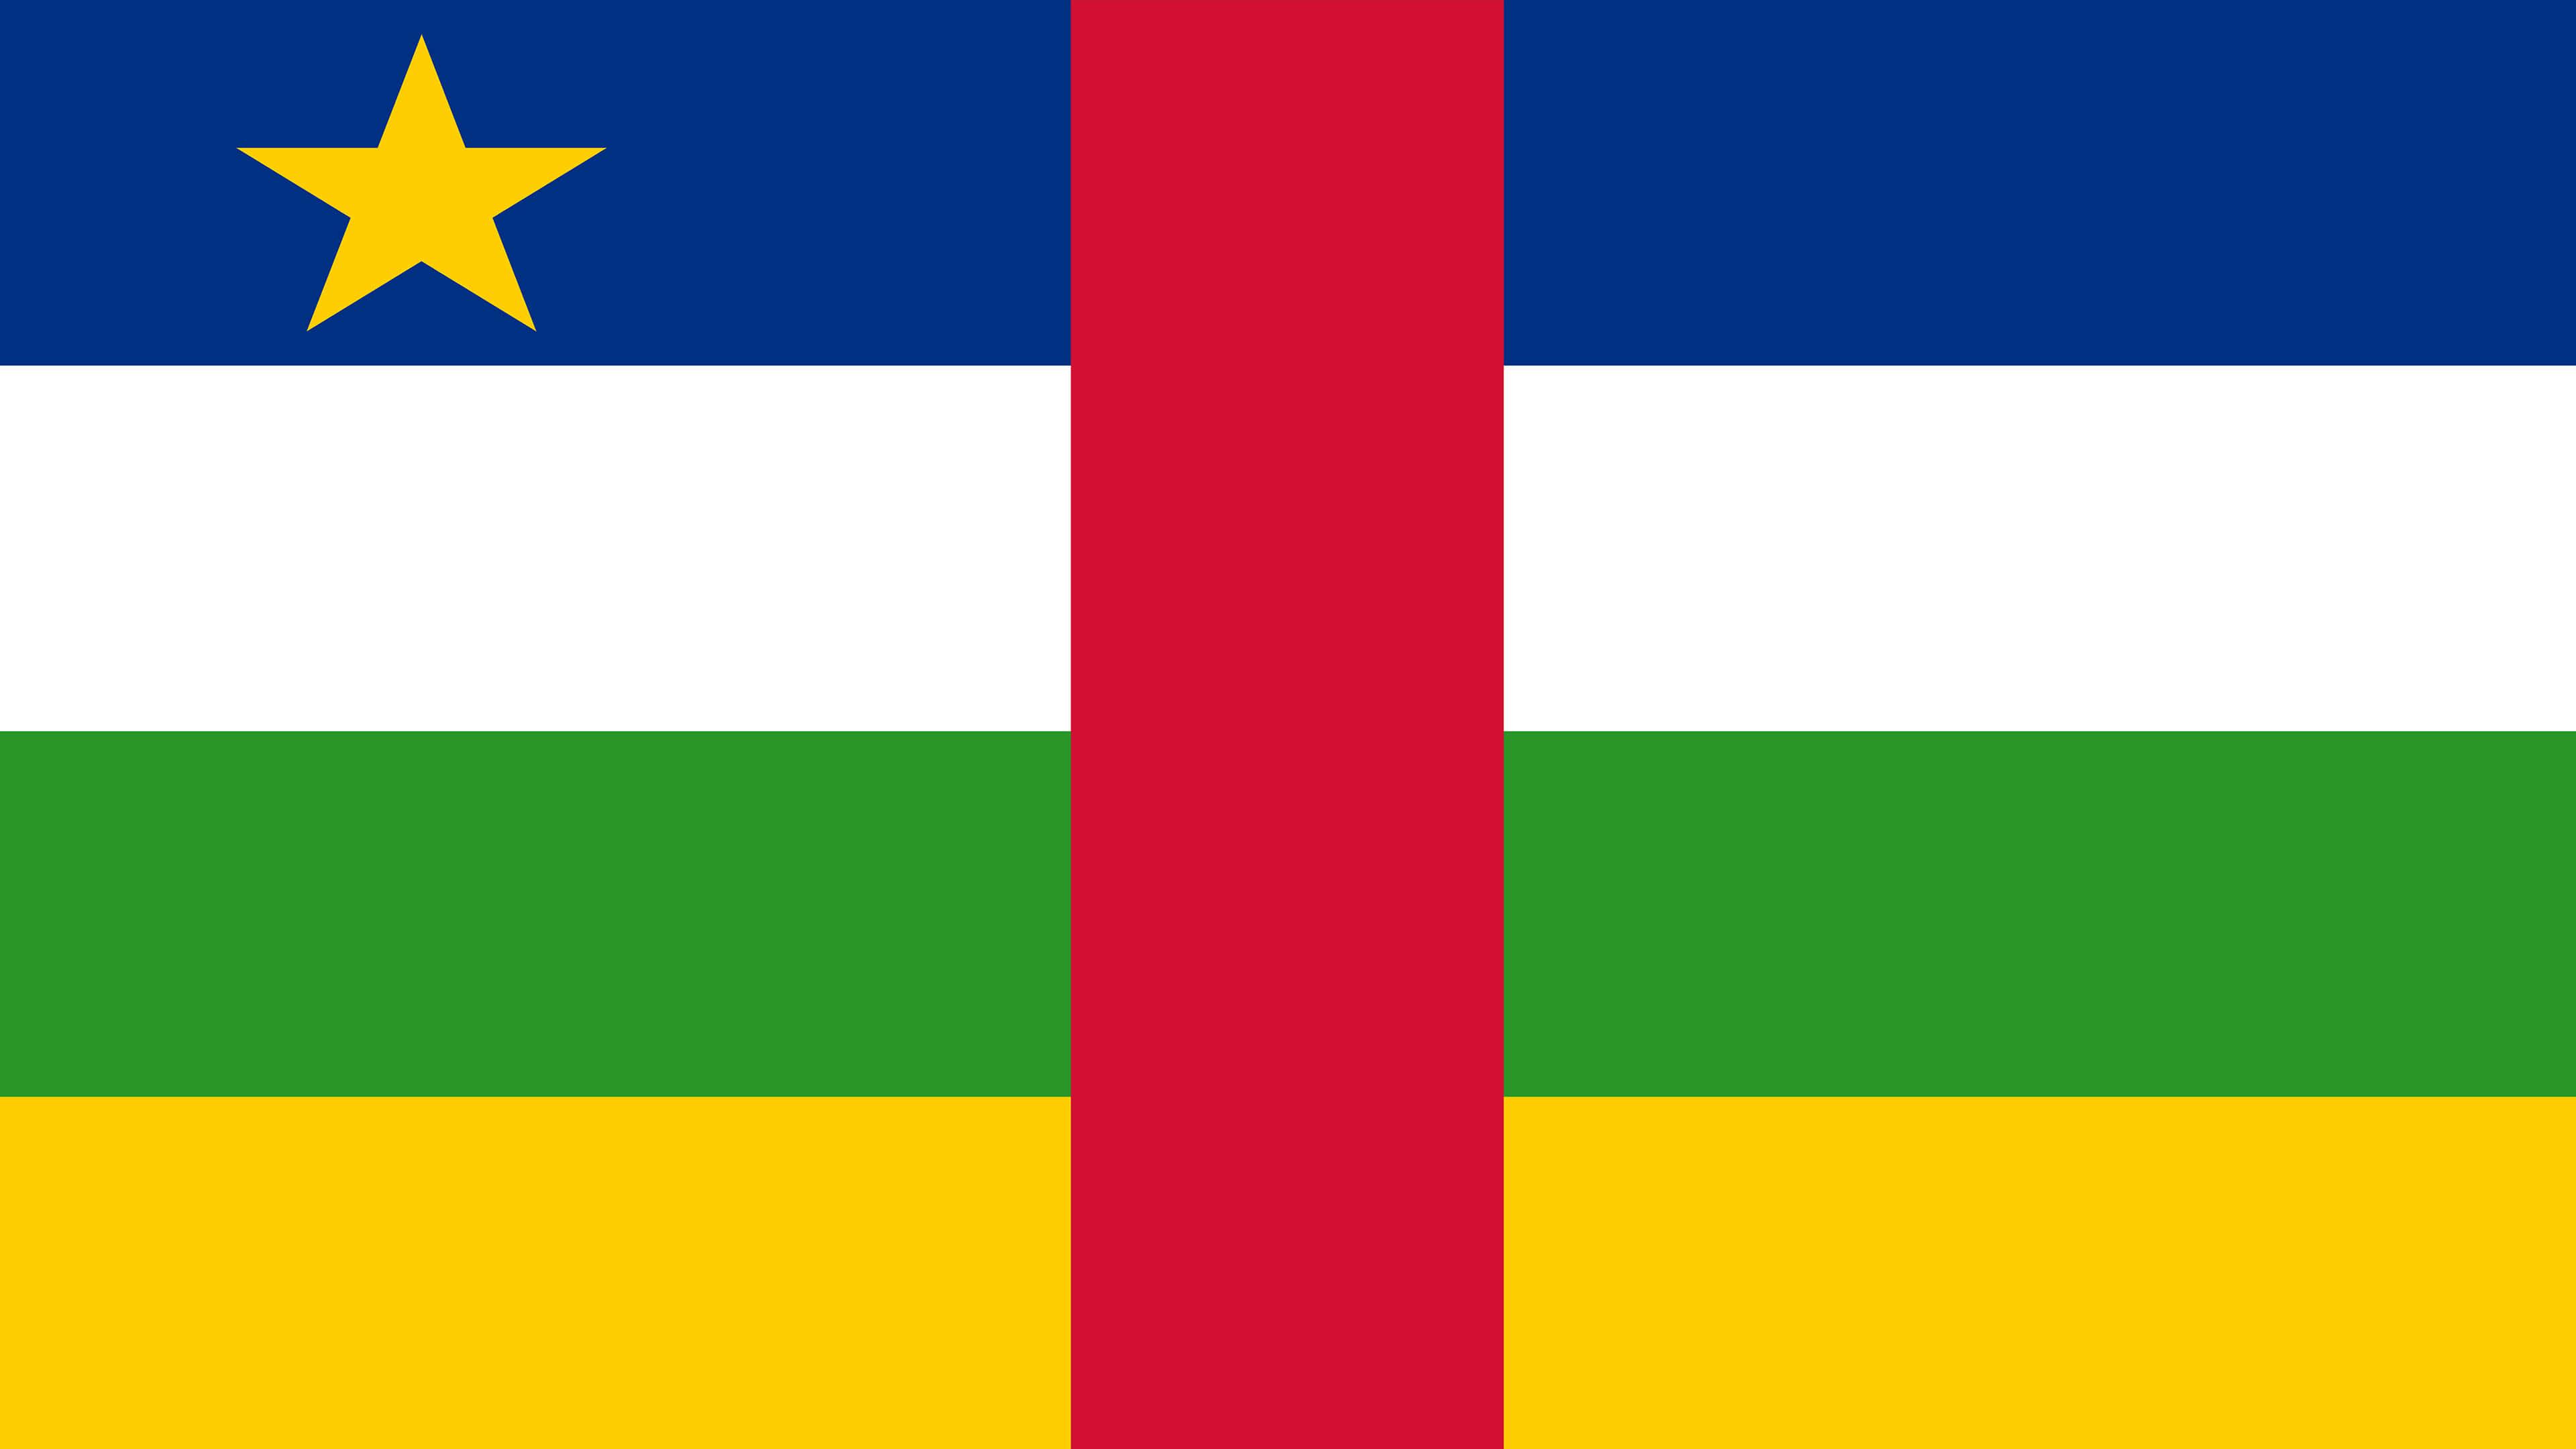 Central African Republic Flag UHD 4K Wallpaper Pixelz 3840x2160